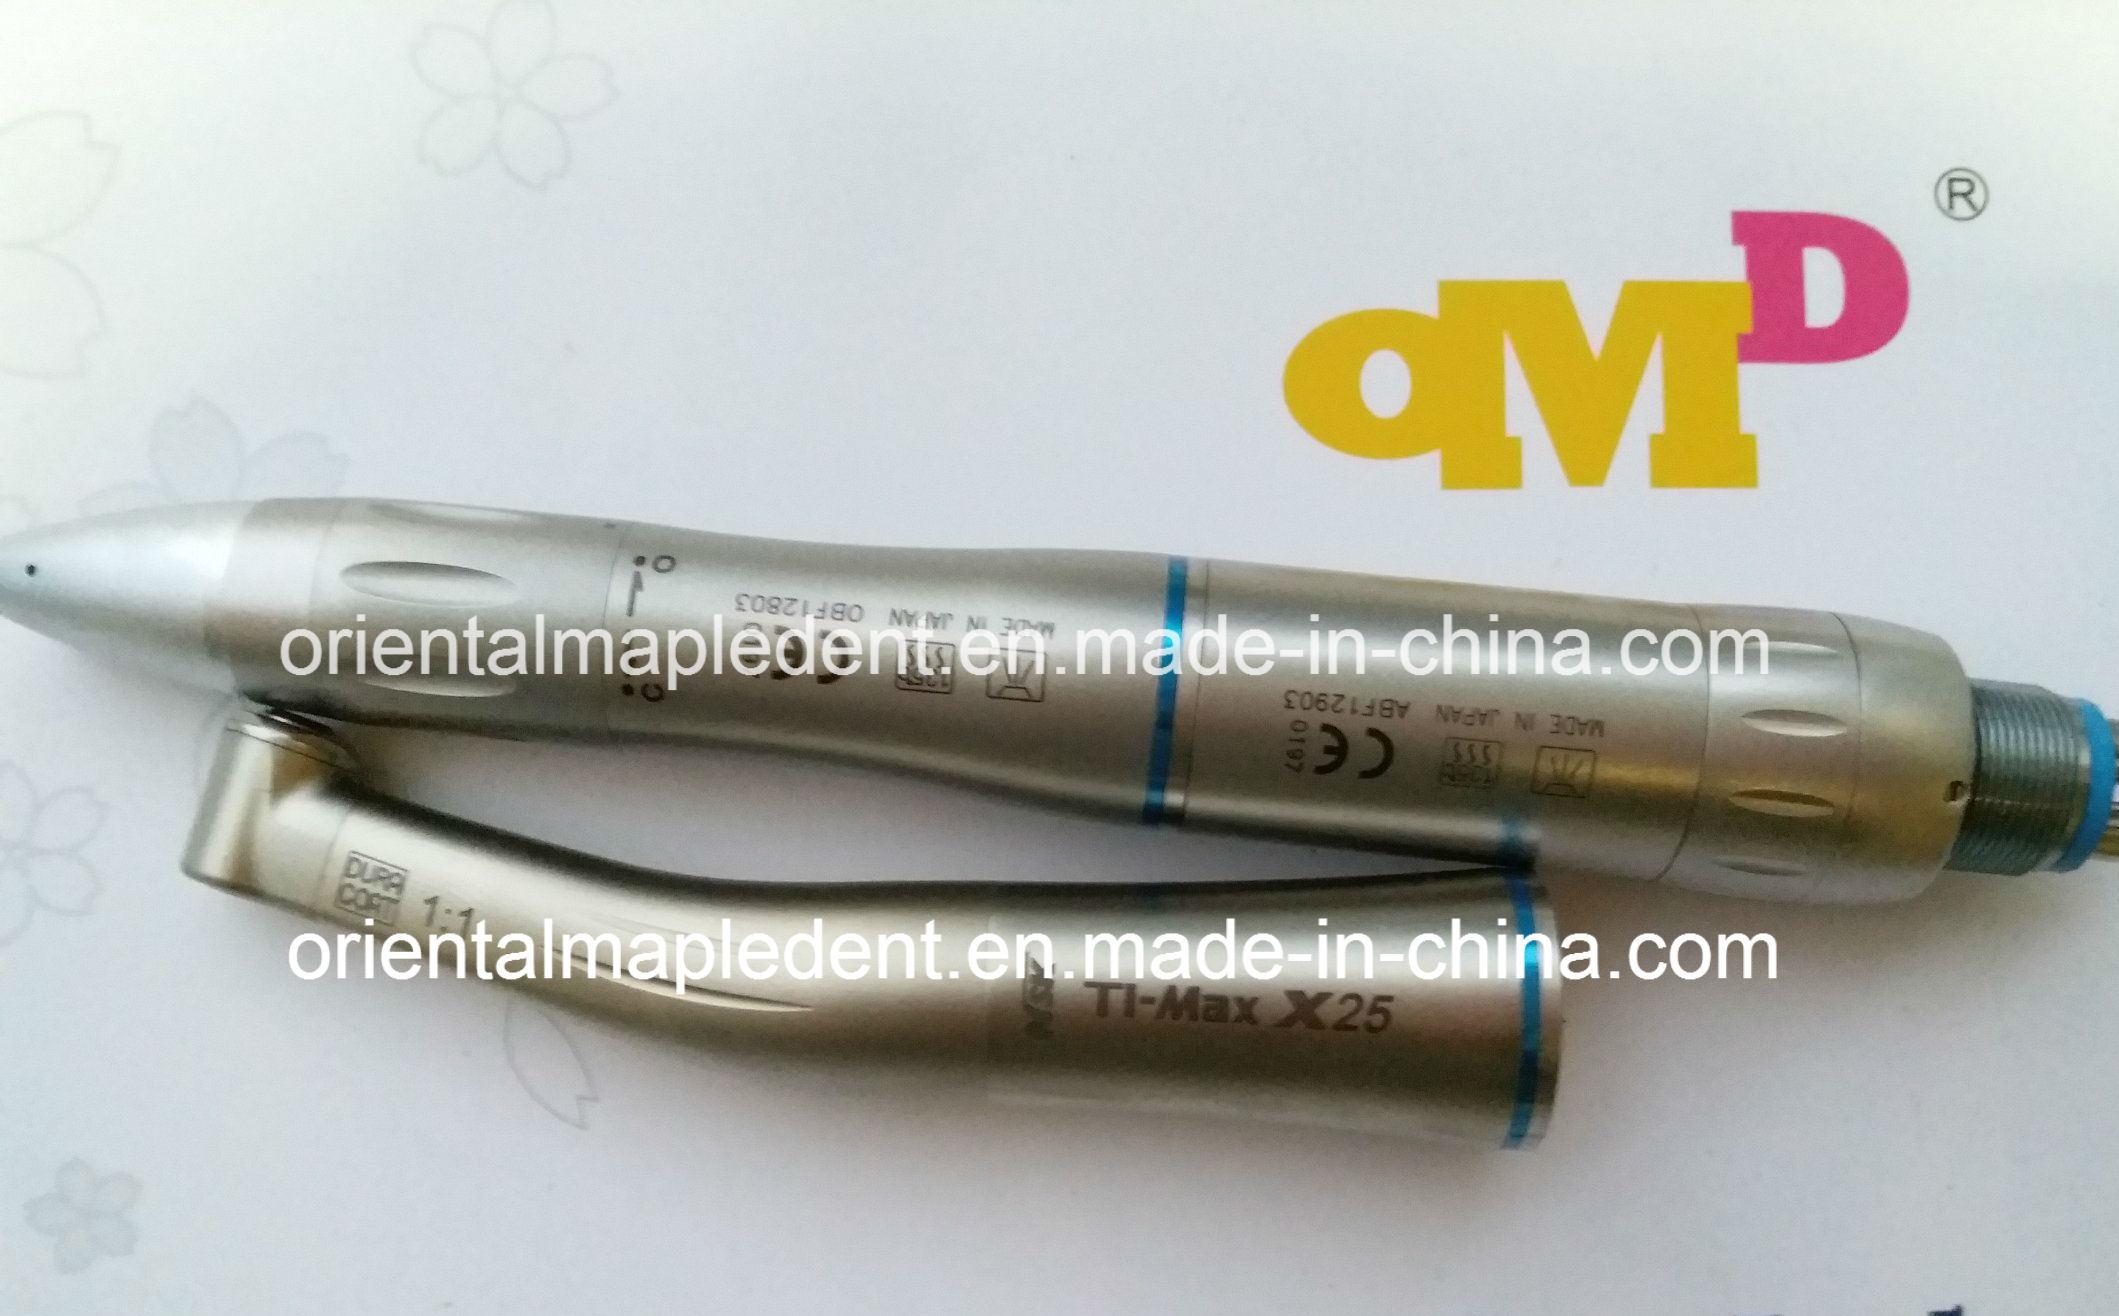 Stainless Steel Body Dental Internal Water Spray Low Speed Handpiece